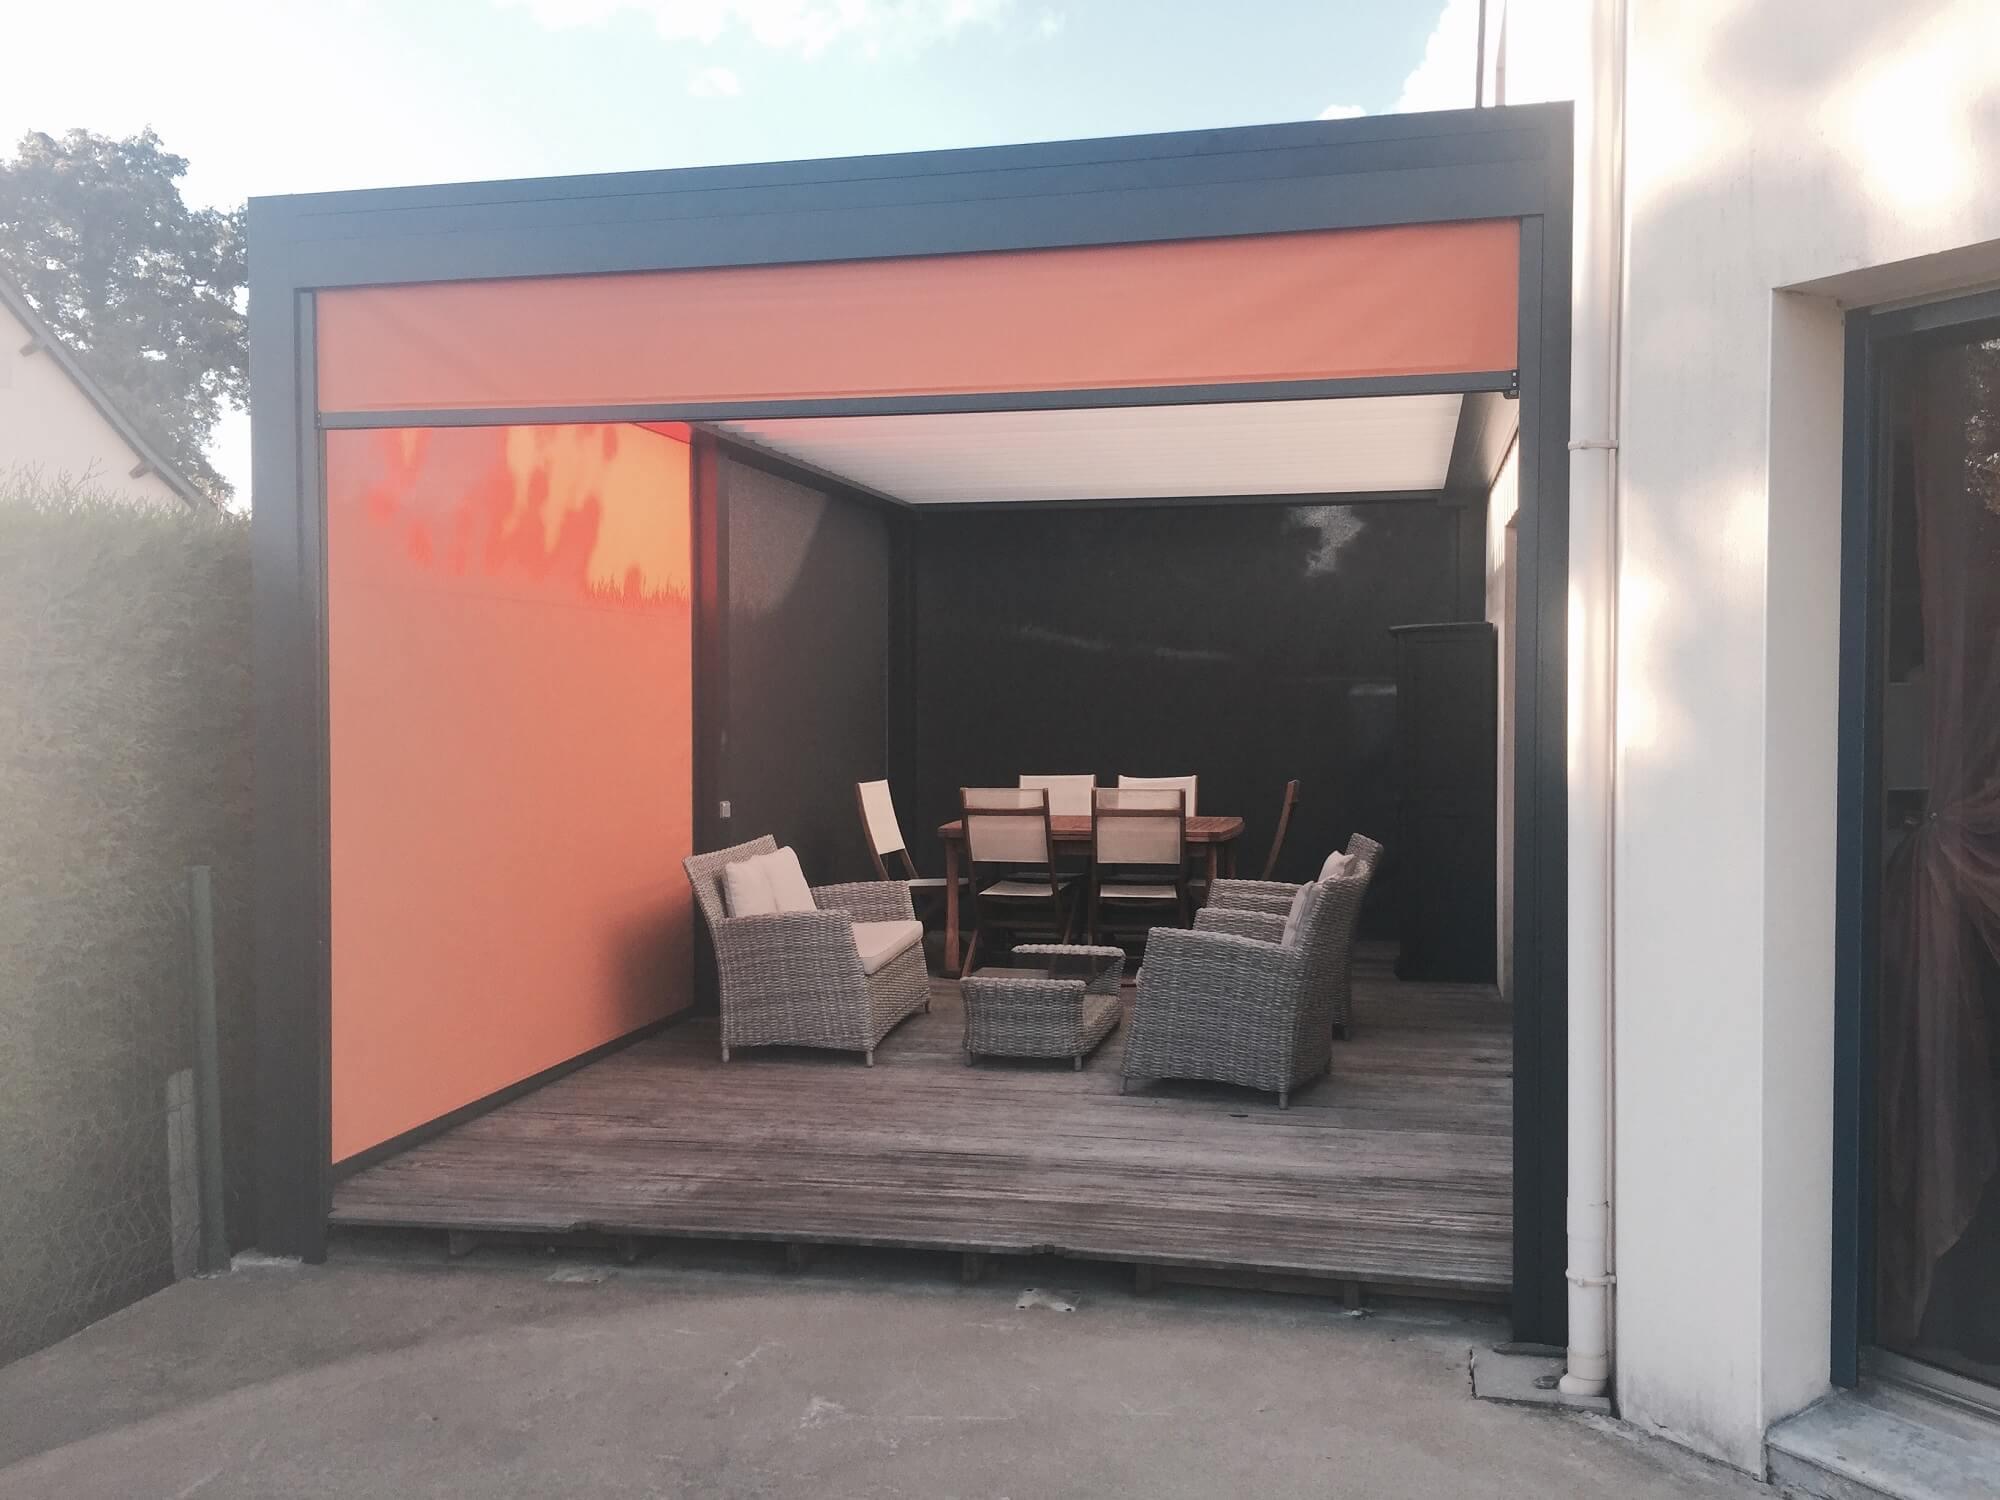 r alisations de la menuiserie solabaie cournon redon. Black Bedroom Furniture Sets. Home Design Ideas